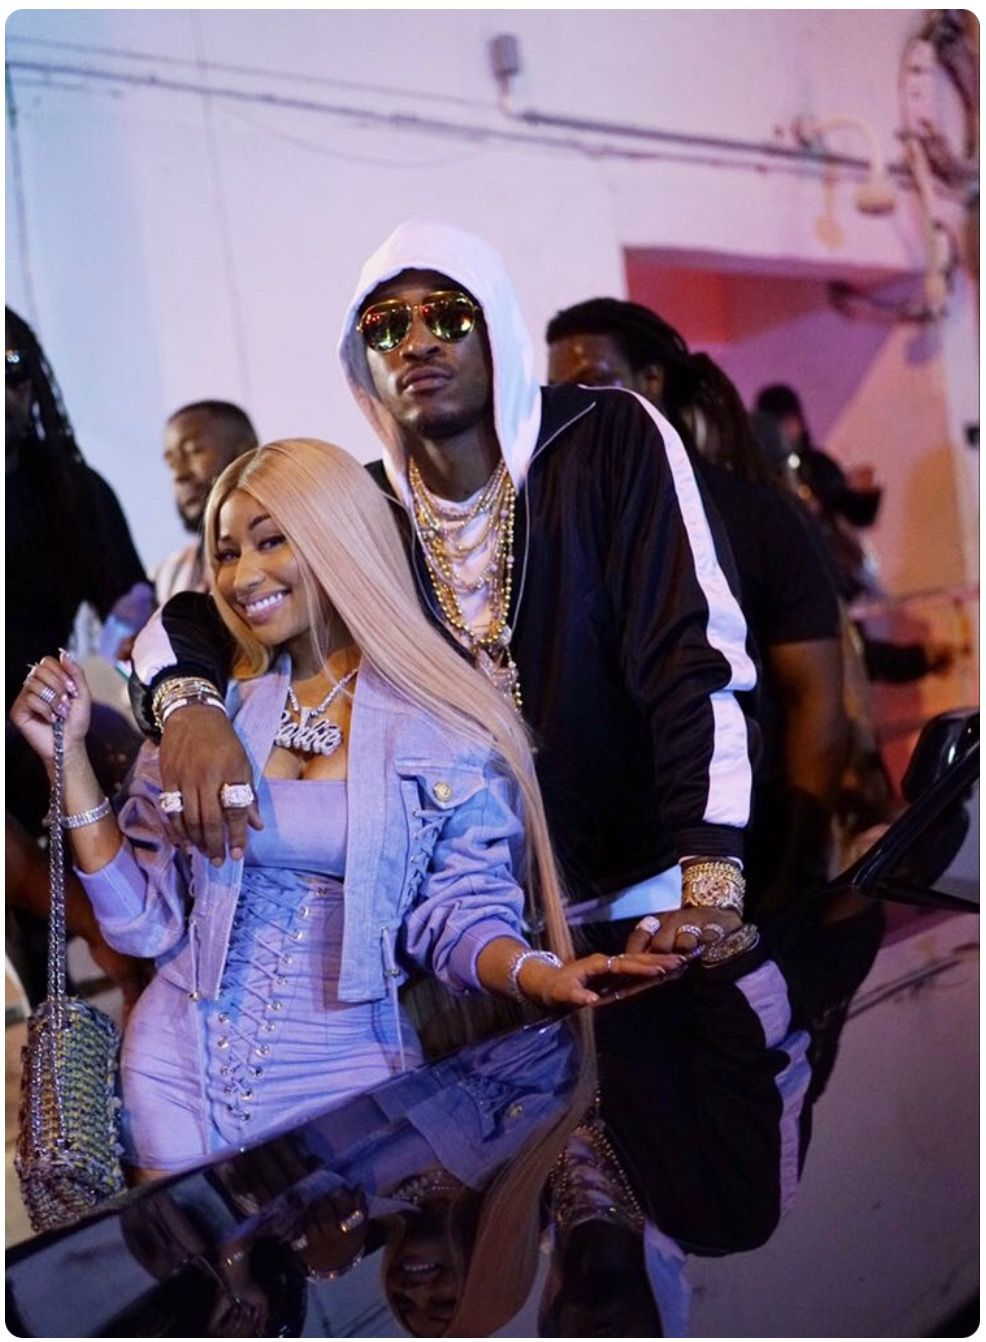 Nicki Minaj and Future Were in Talks to Release a Collaborative Mixtape |  Complex